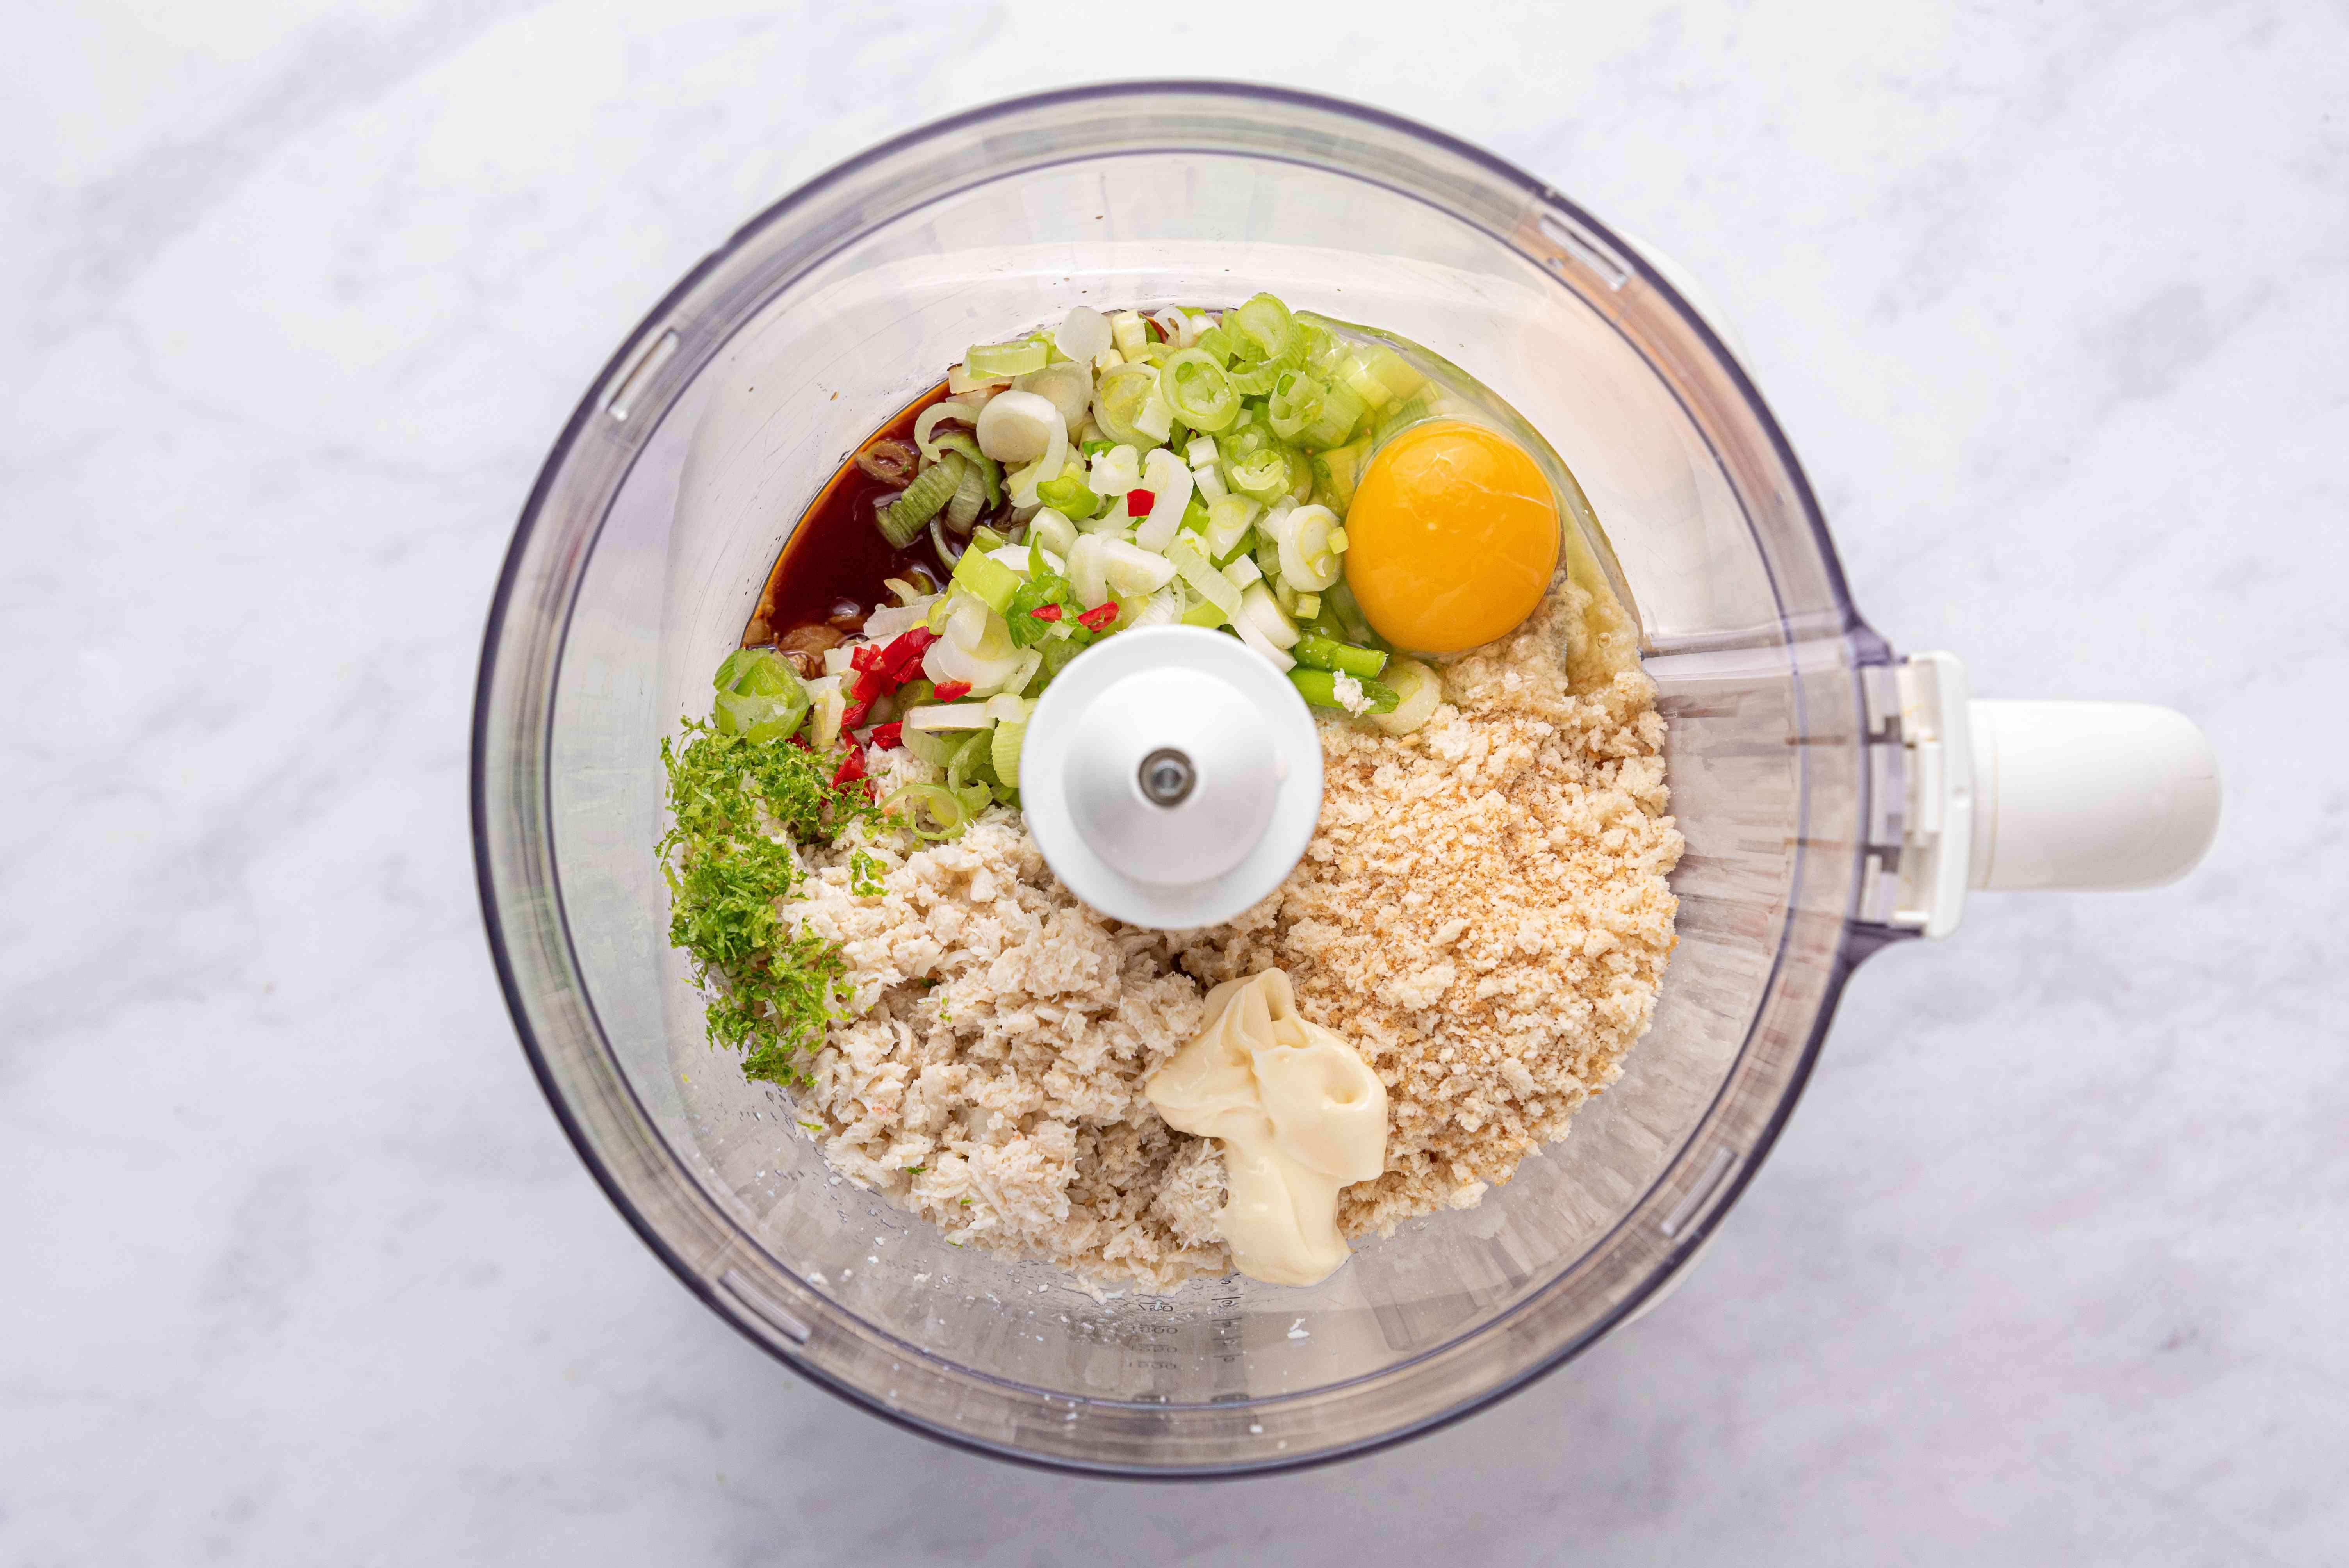 Thai Crab Cakes ingredients in a food processor